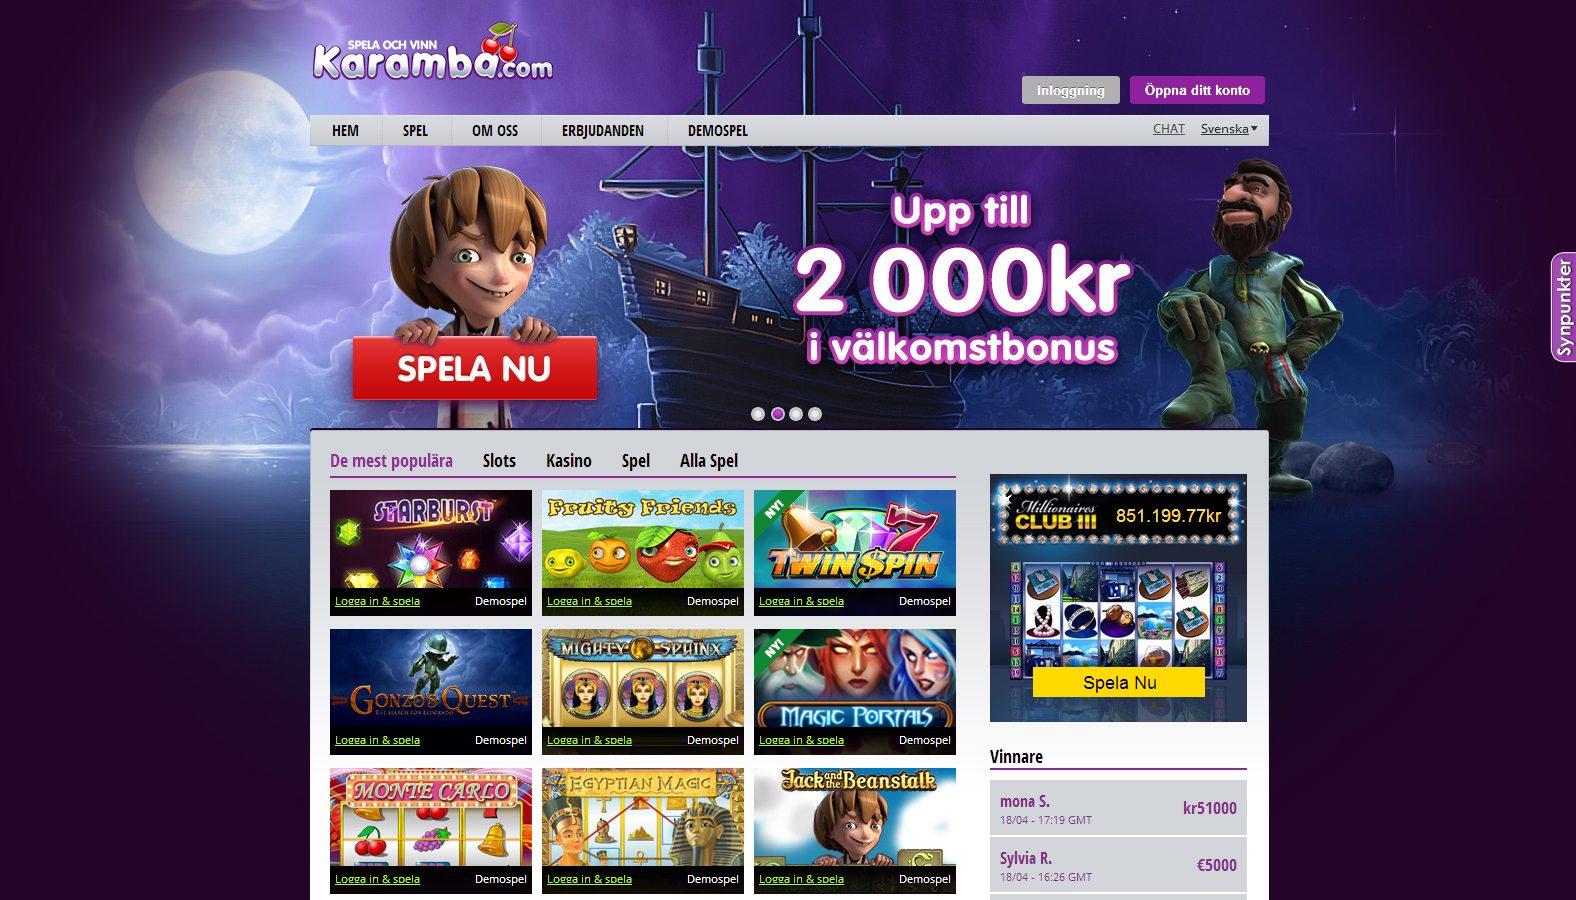 svenska online casino jetzt spelen